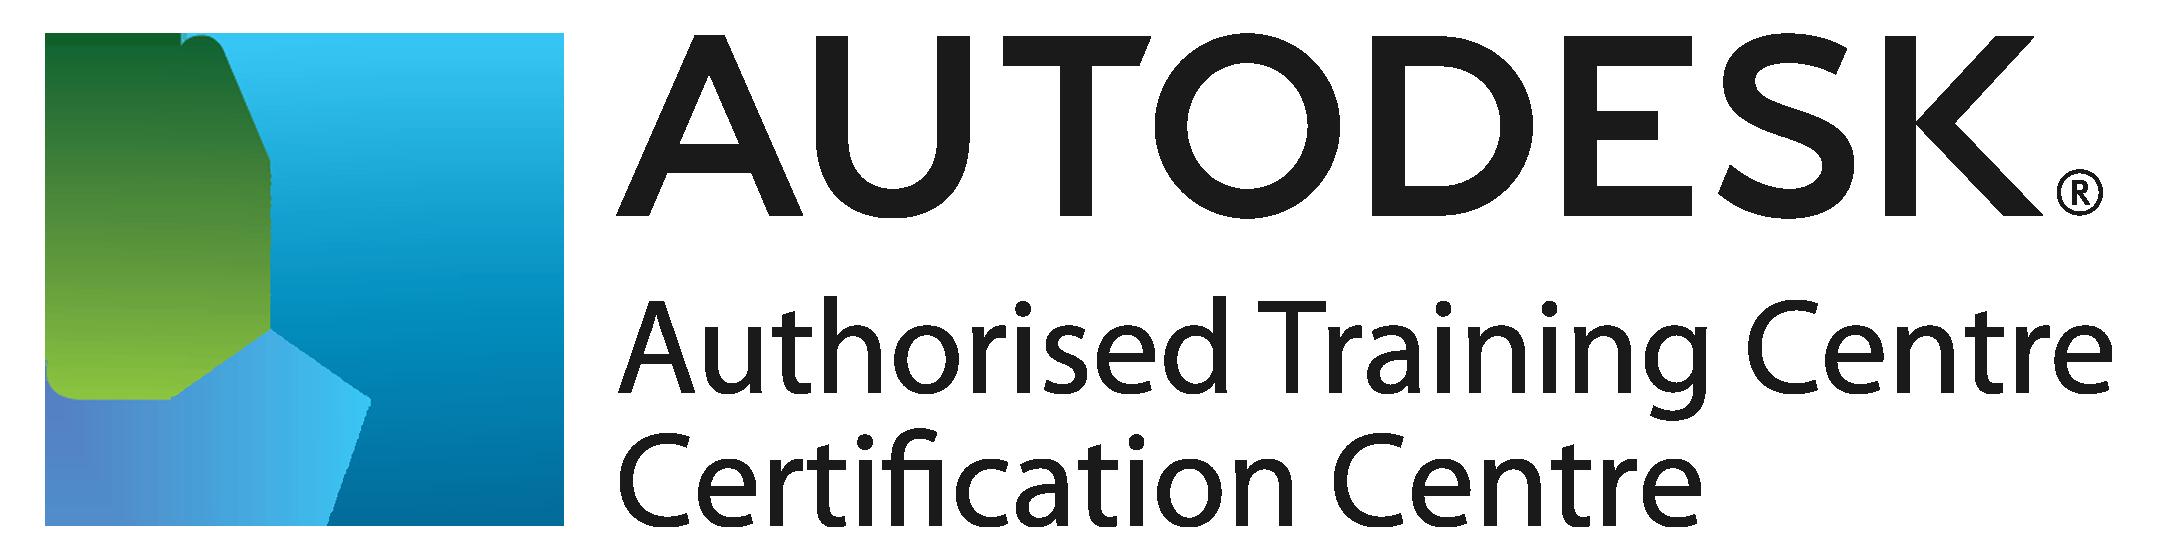 http://Logotipo%20Oficial%20Autodesk%20-%20Revit